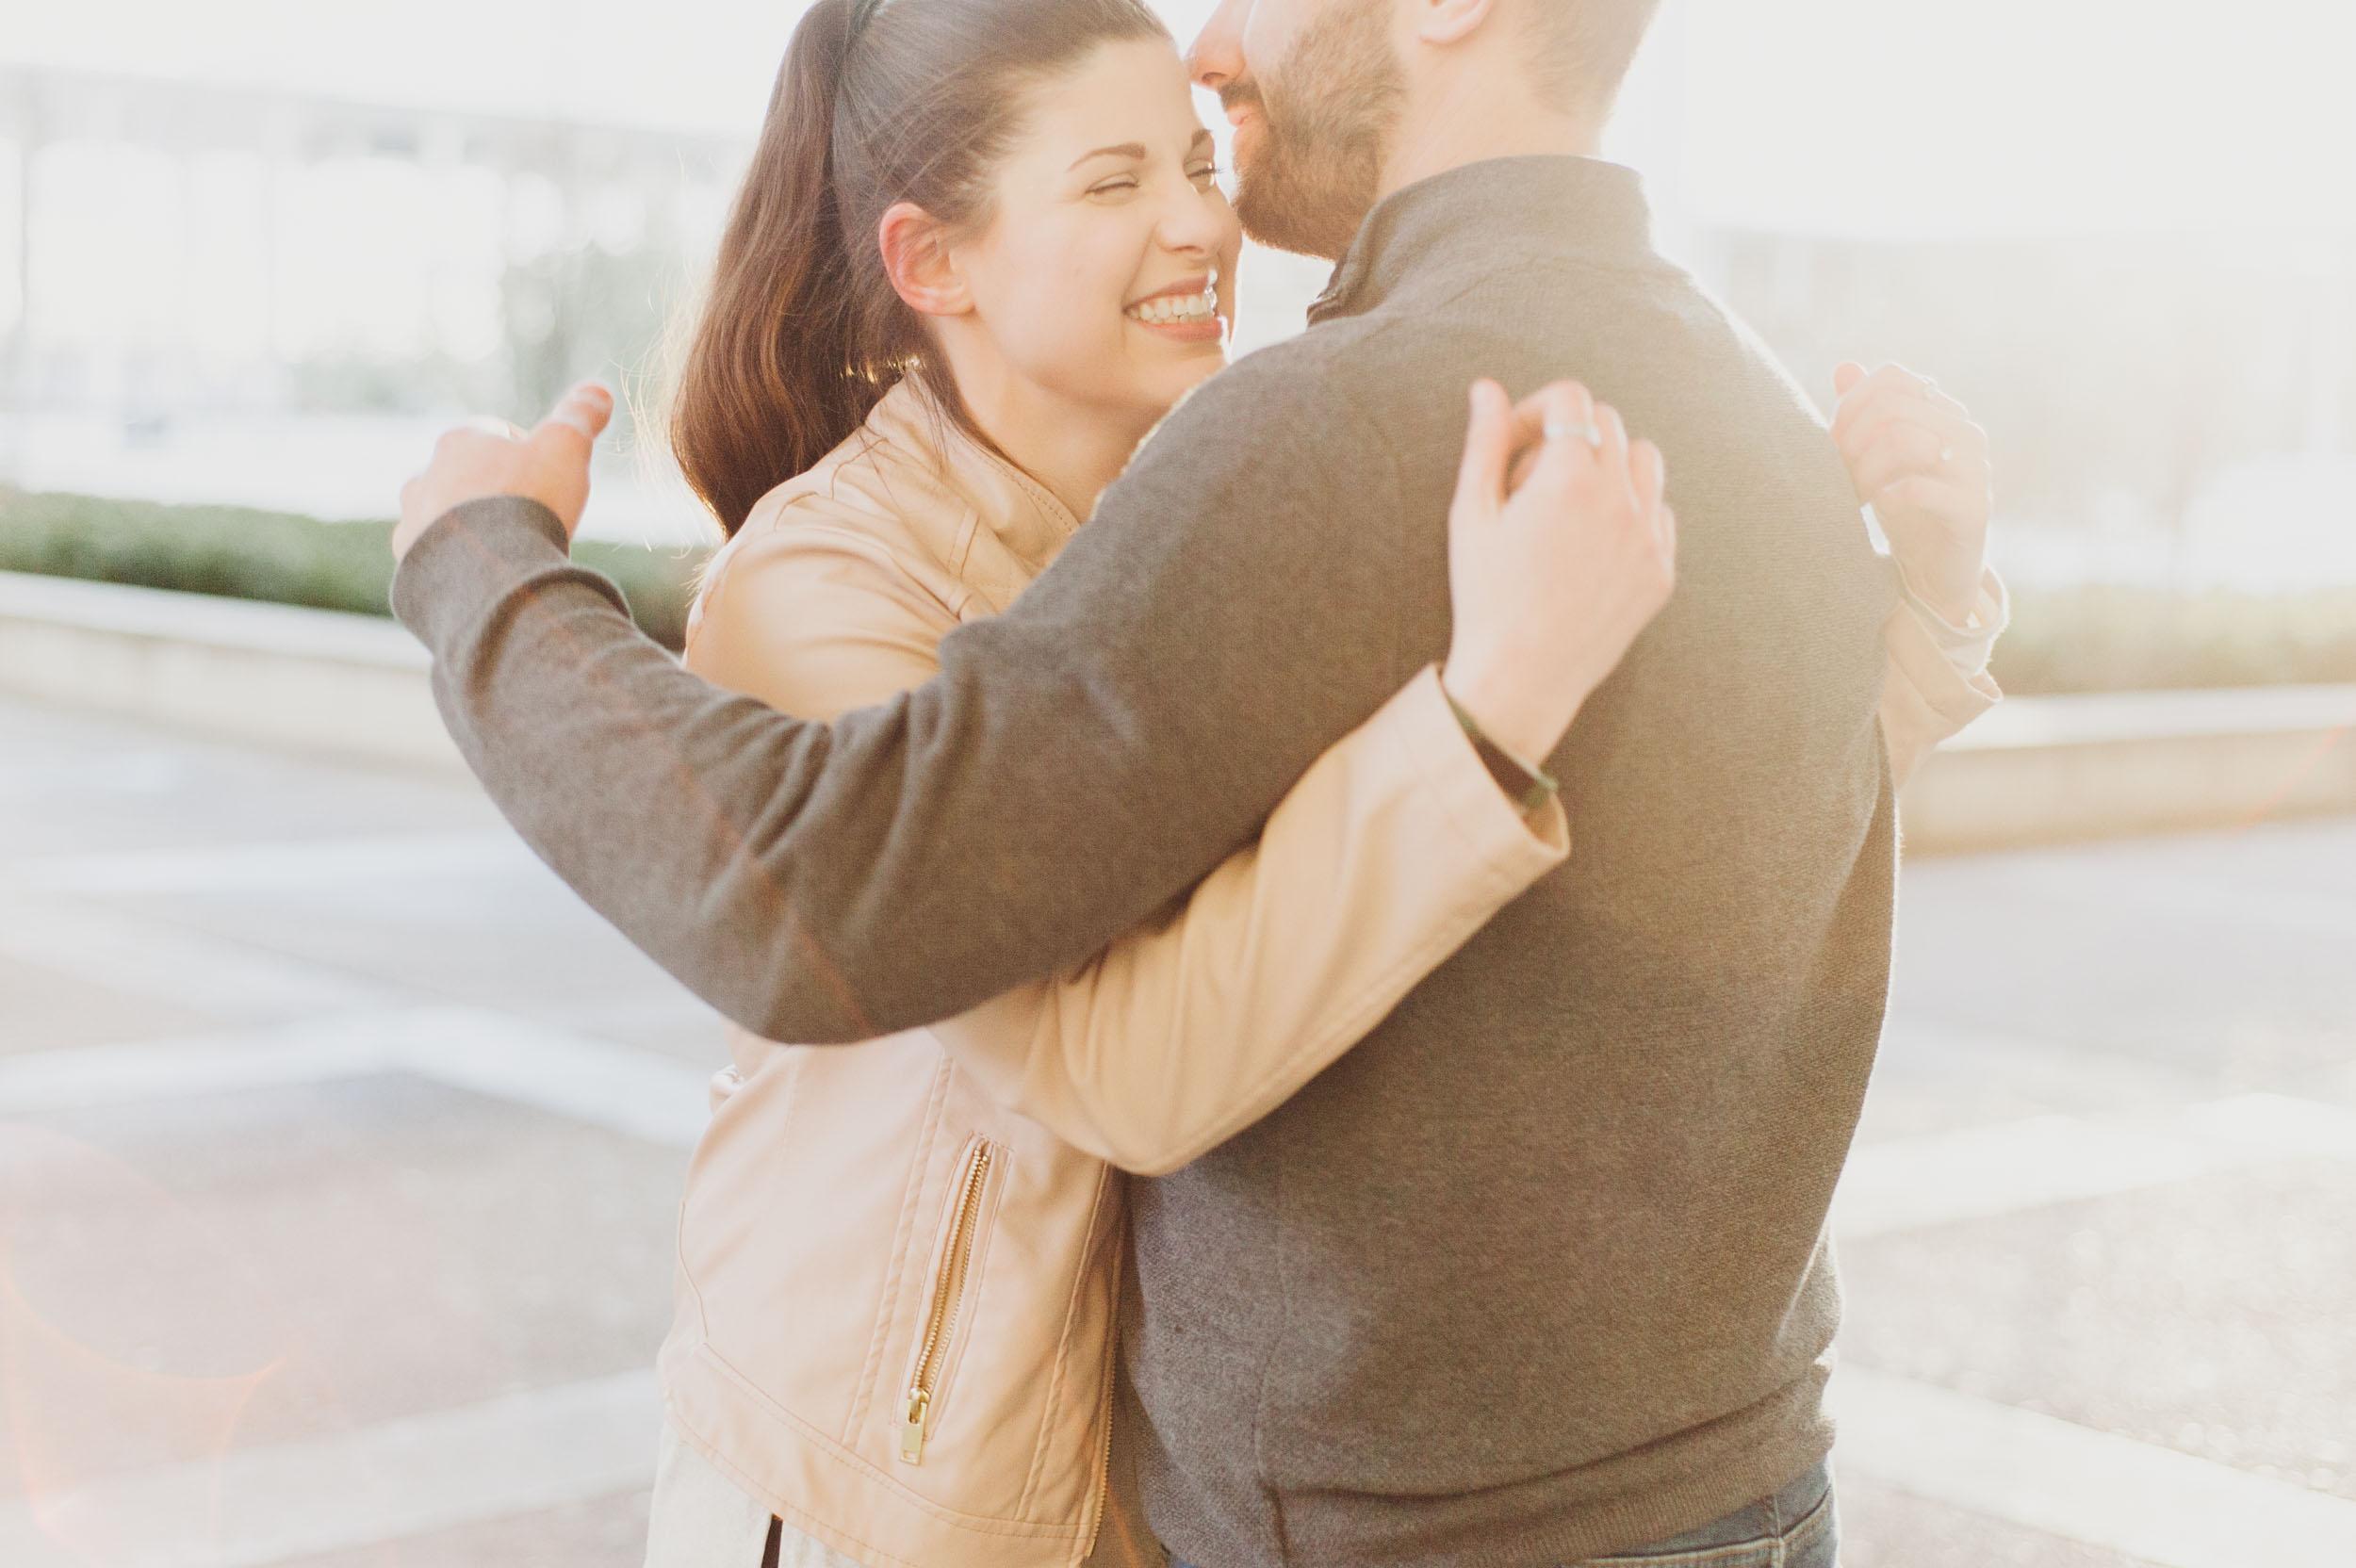 A young caucasian man and woman joyfully embrace as yellow orange sunlight wraps around them.